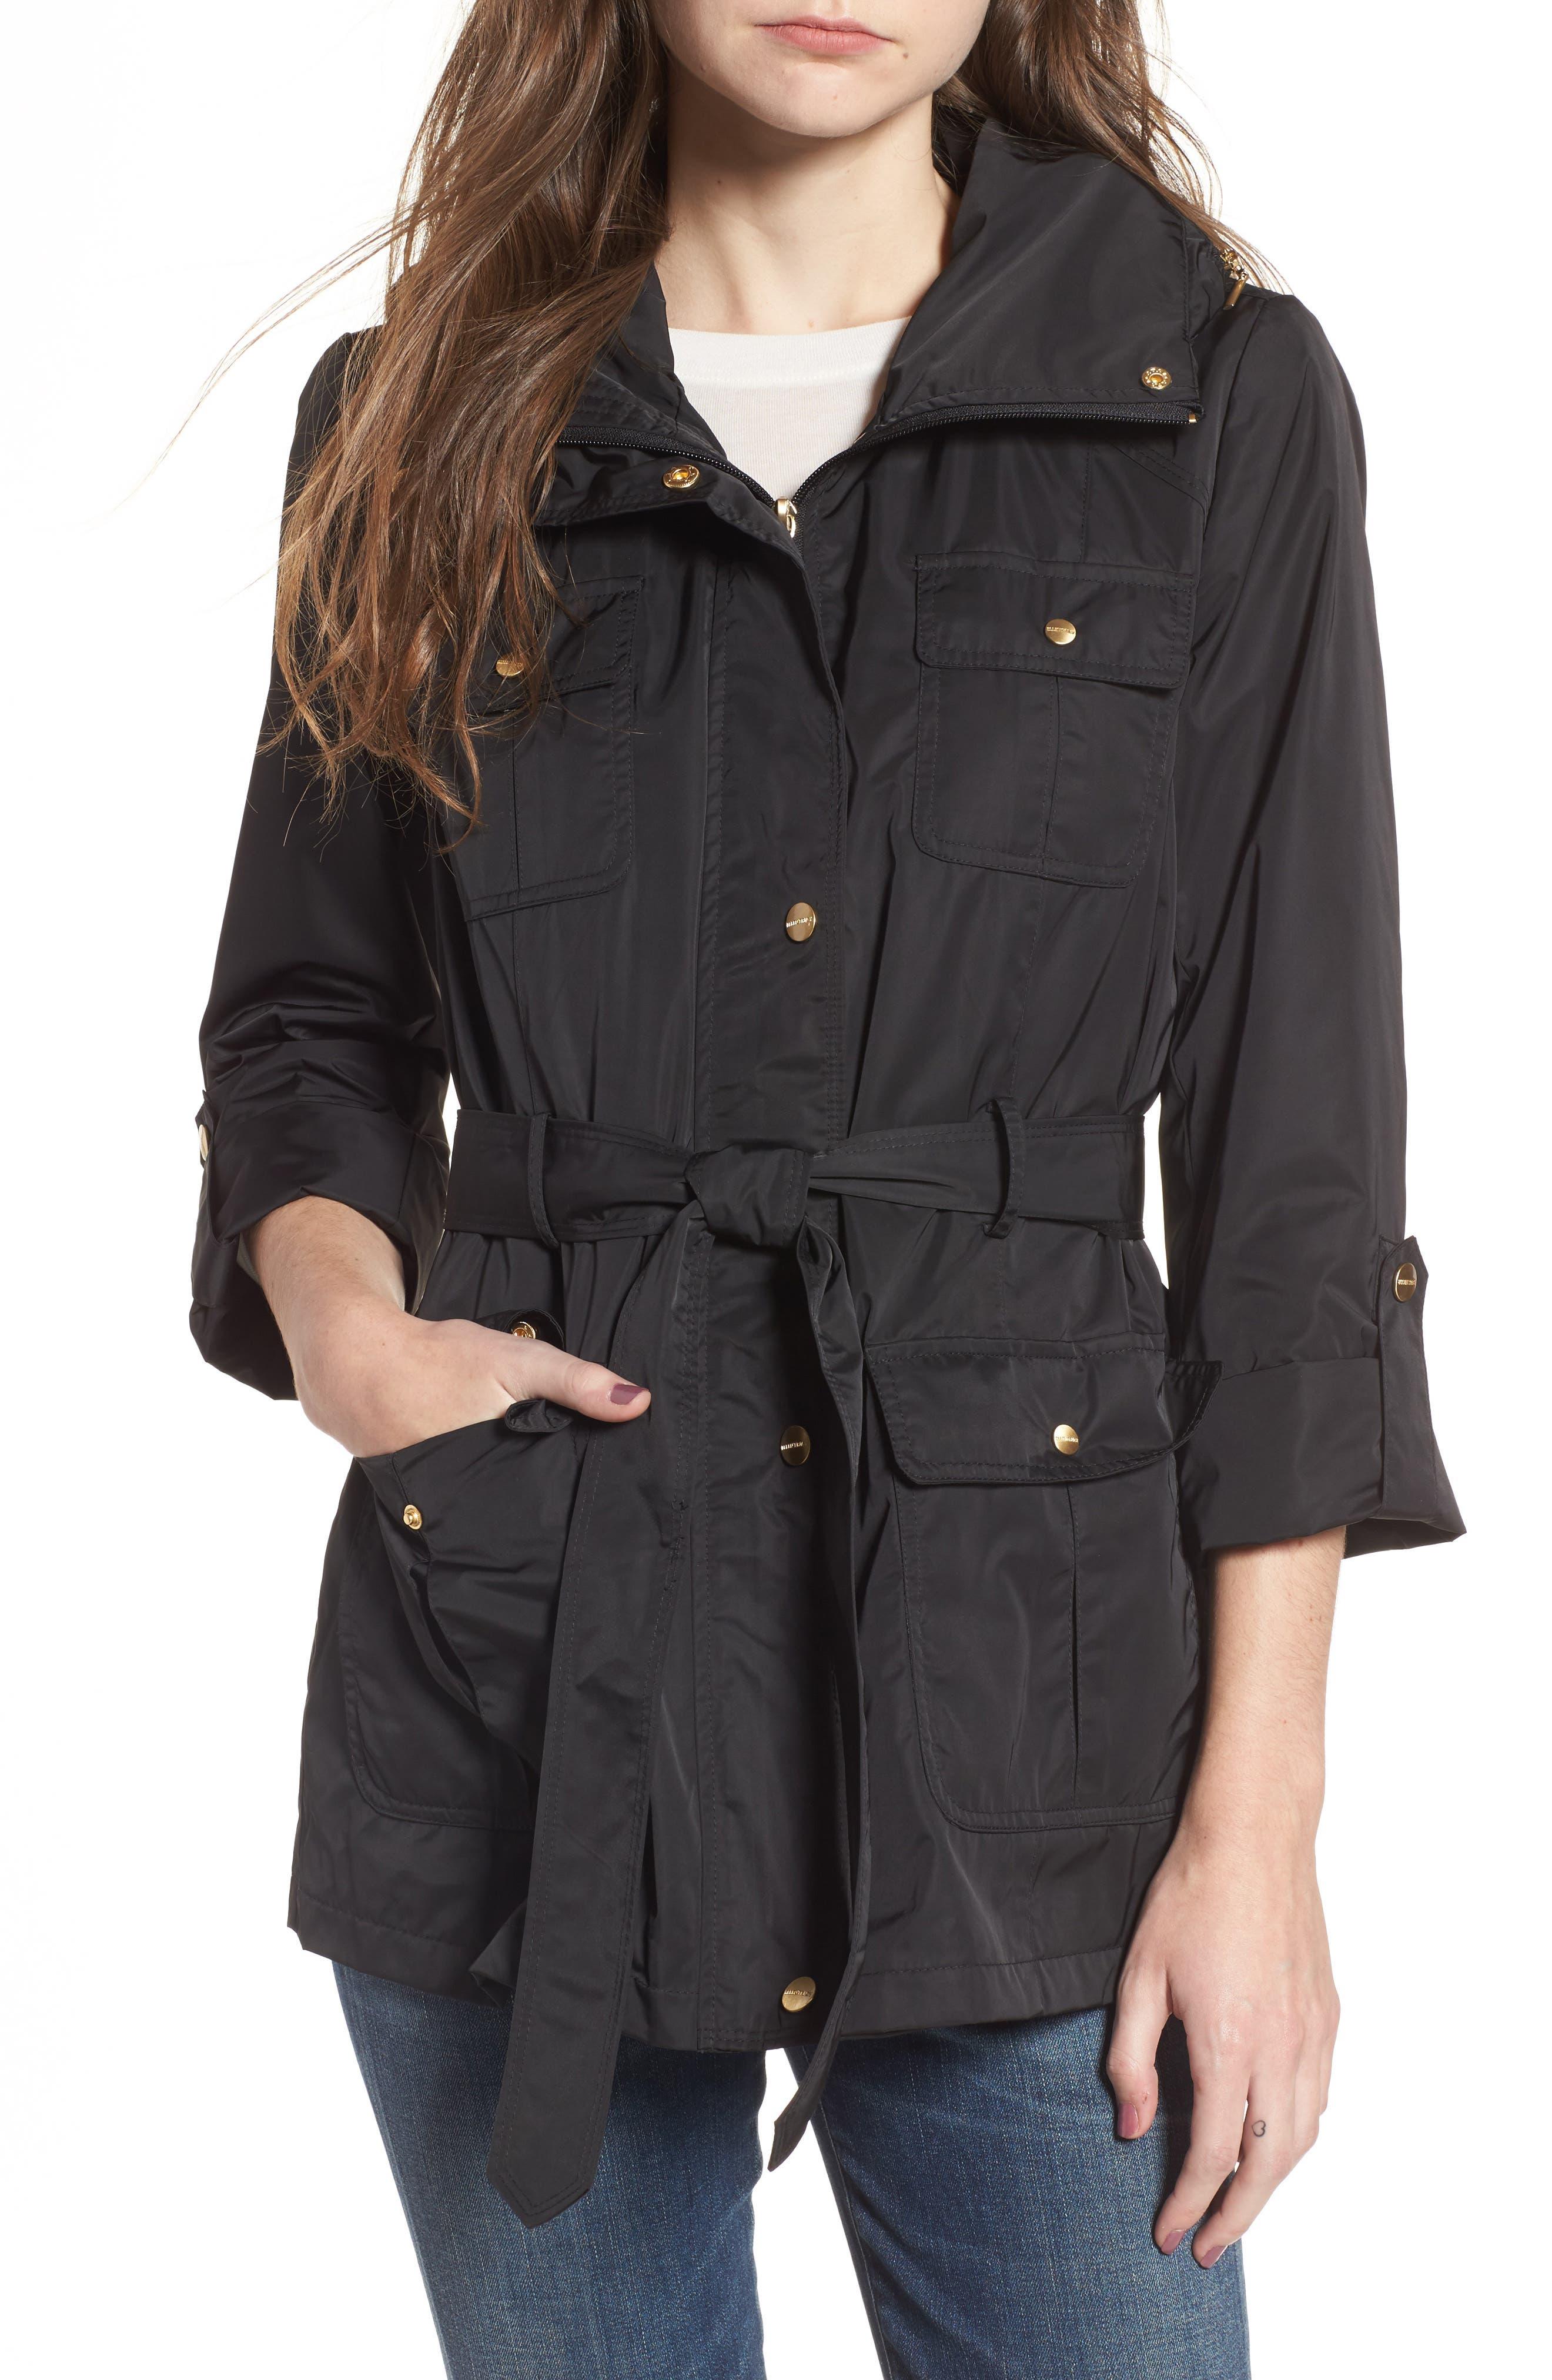 Techno Short Trench Coat,                         Main,                         color, 001